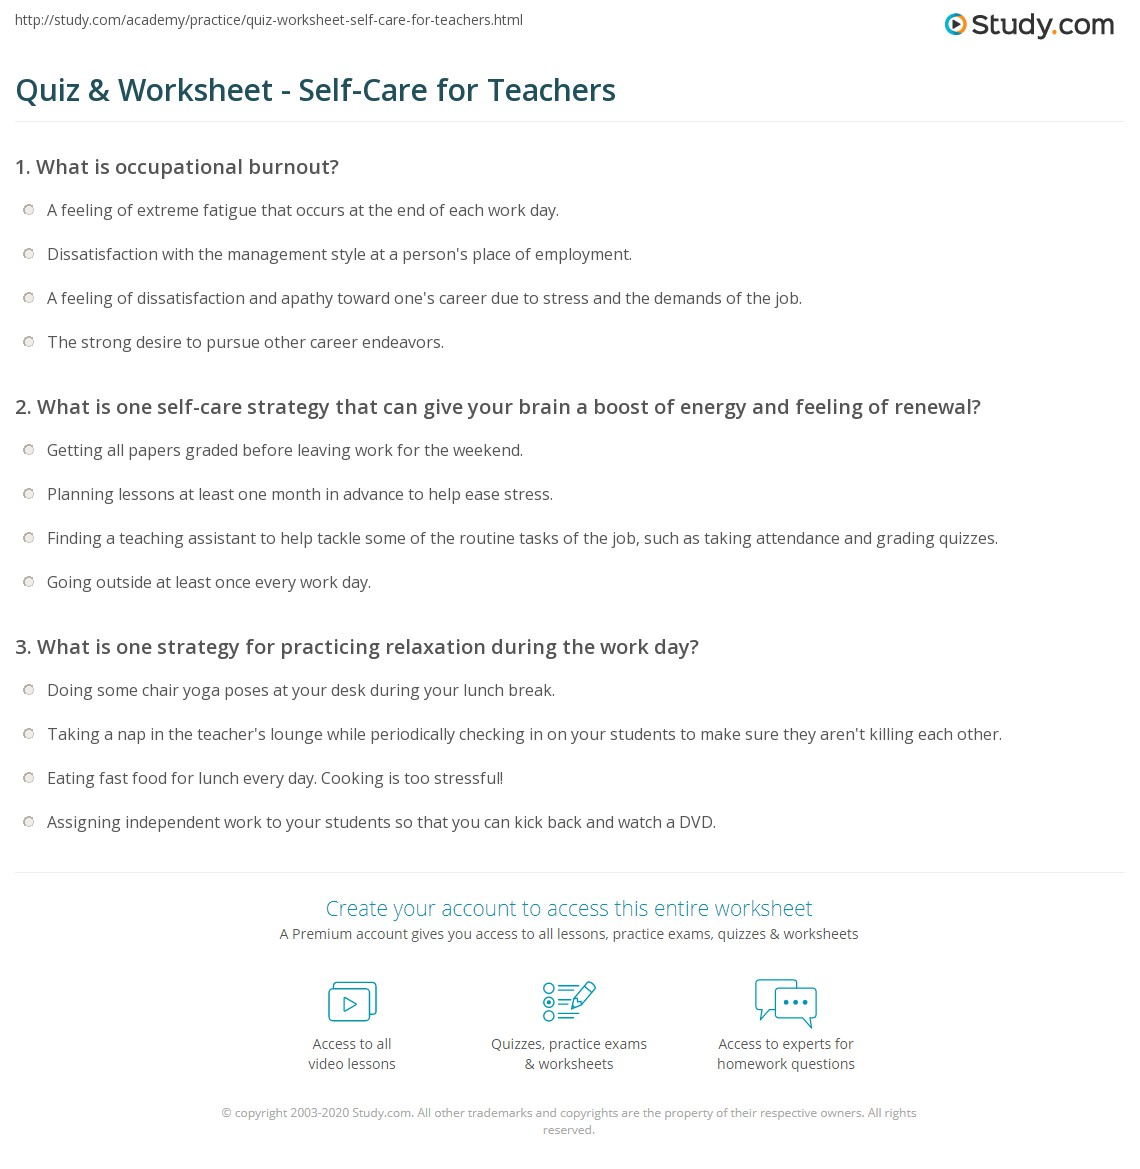 worksheet Self Care Worksheets quiz worksheet self care for teachers study com print worksheet